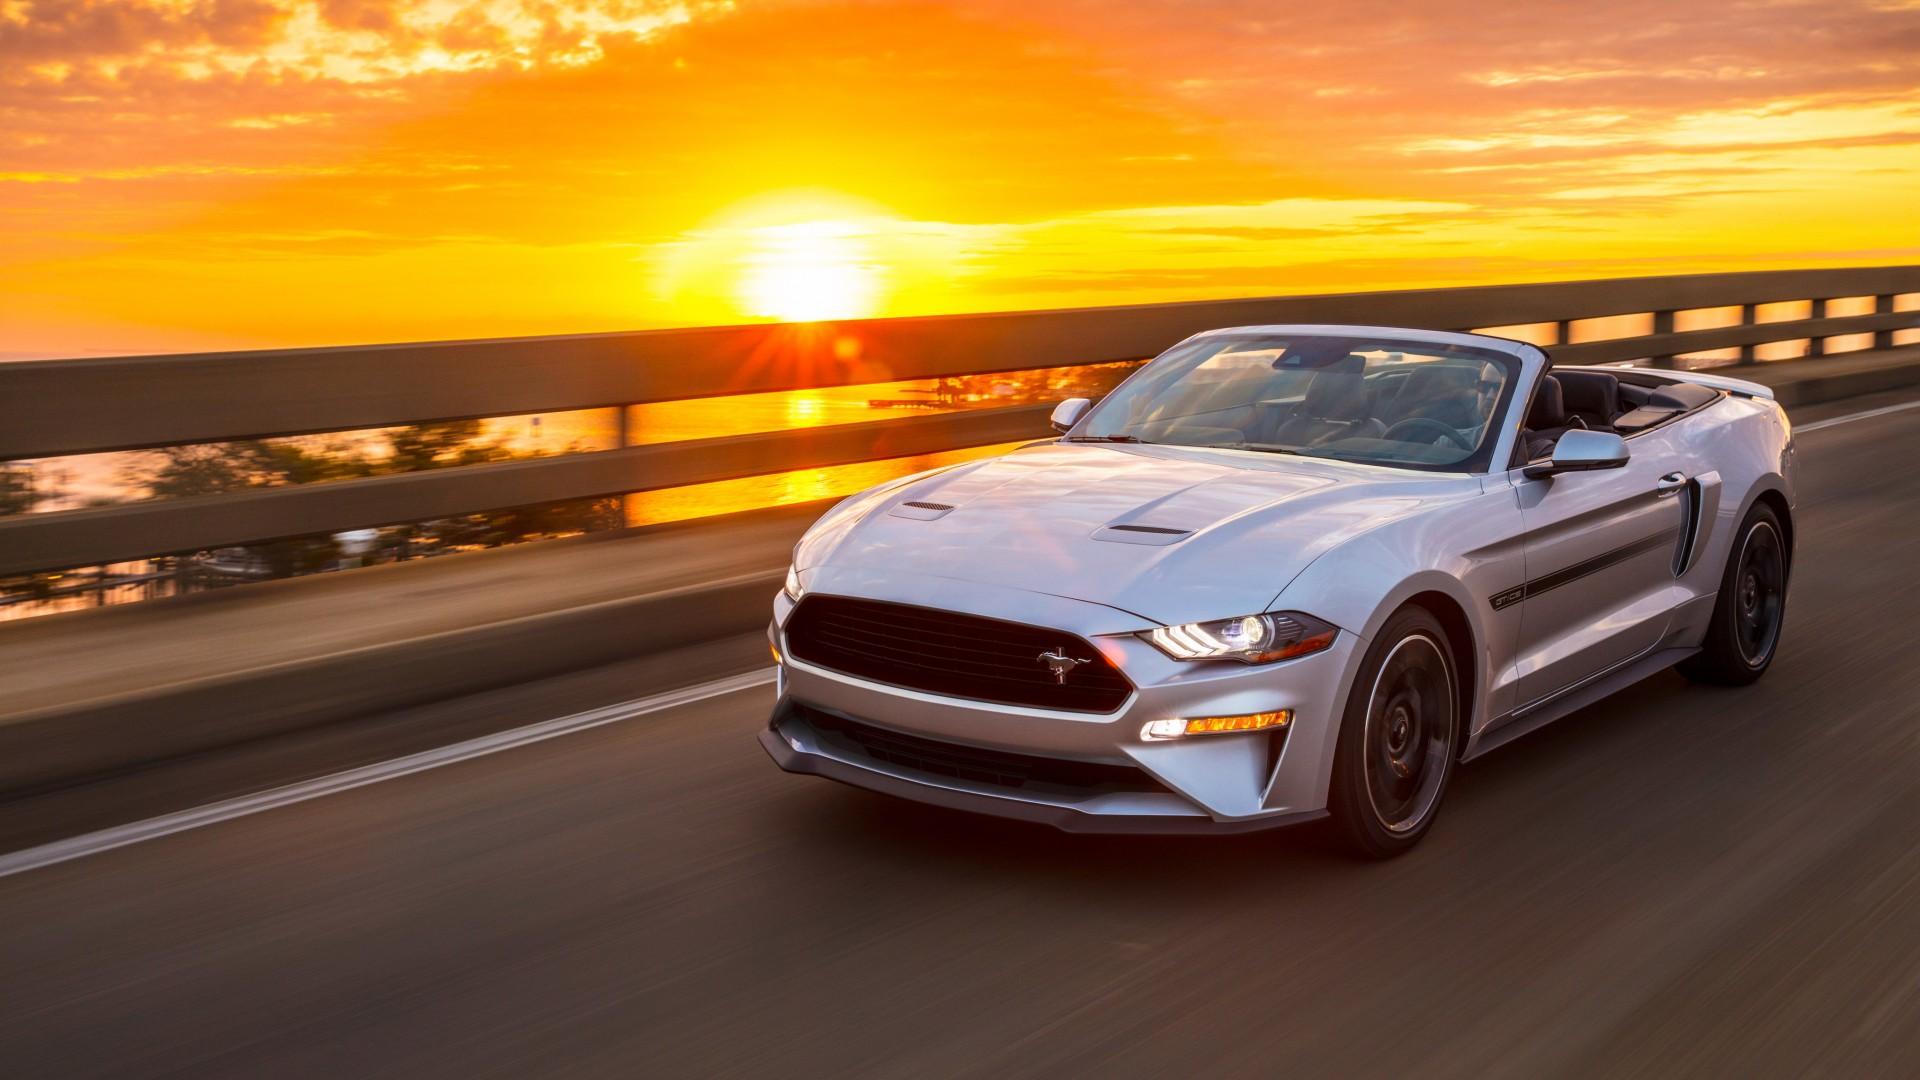 2019 Ford Mustang Gt Convertible California 4k 2 Wallpaper